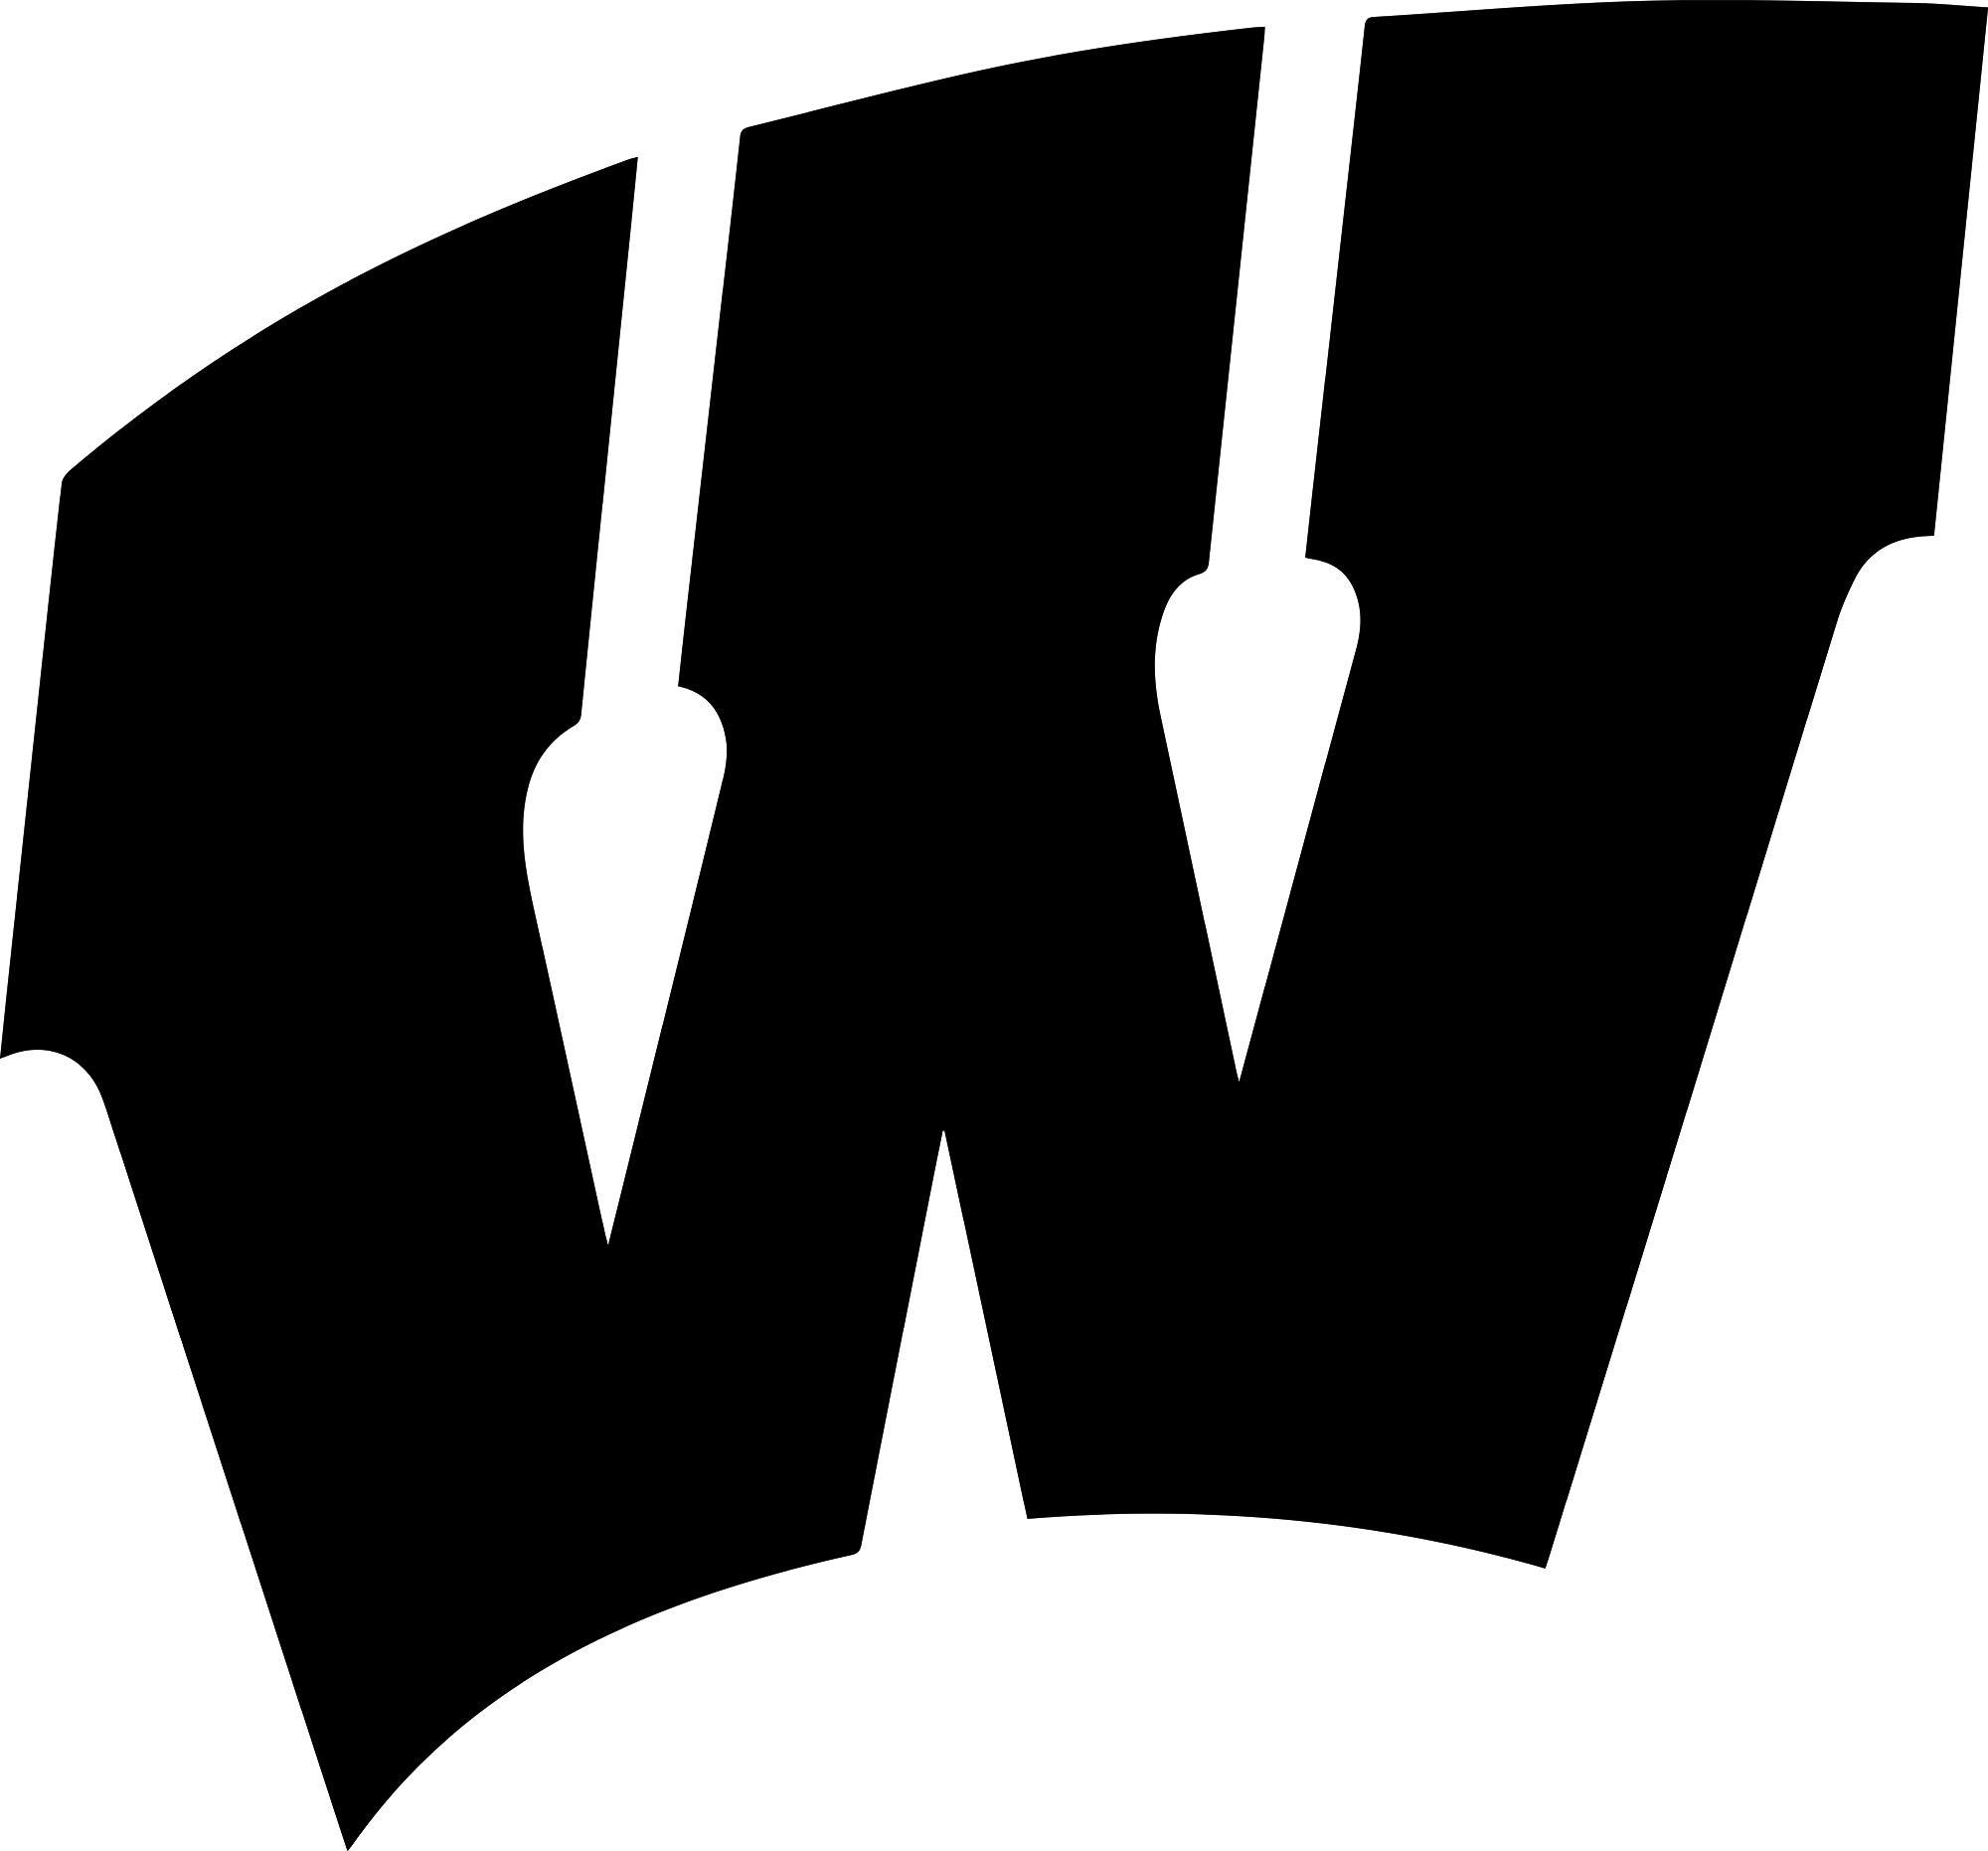 ANGDEST Wisconsin Badgers Logo (Black) Waterproof Vinyl Decal Stickers for Laptop Phone Helmet Car Window Bumper Mug Tuber Cup Door Wall Decoration